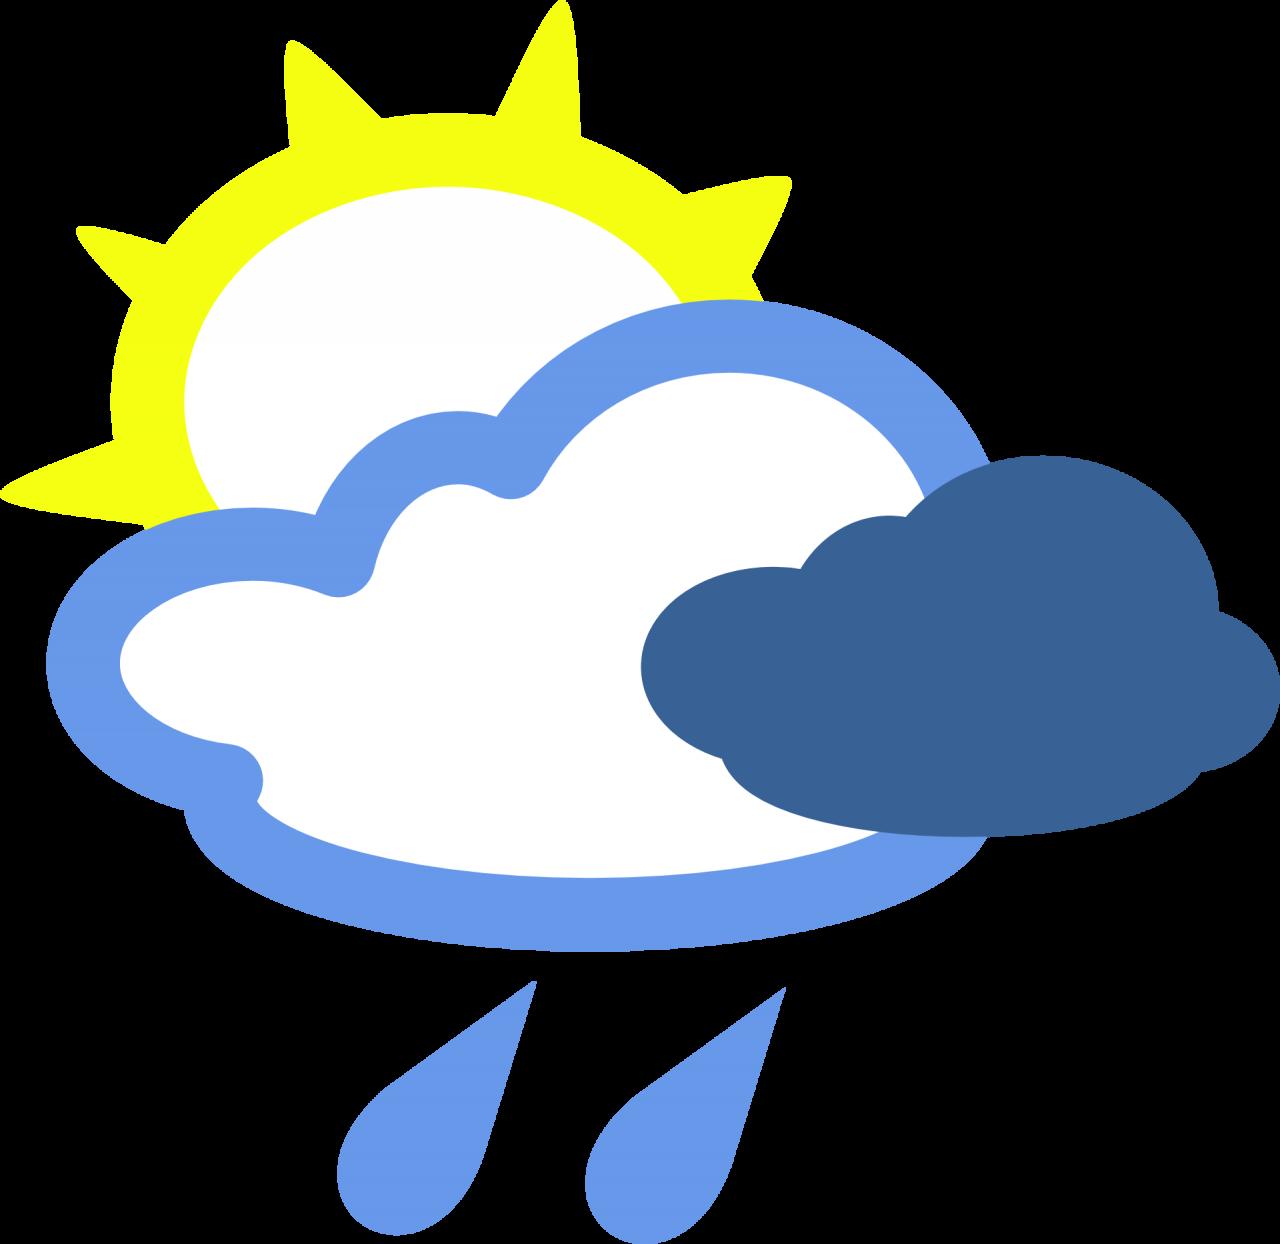 Weather Forecast symbol PNG Image